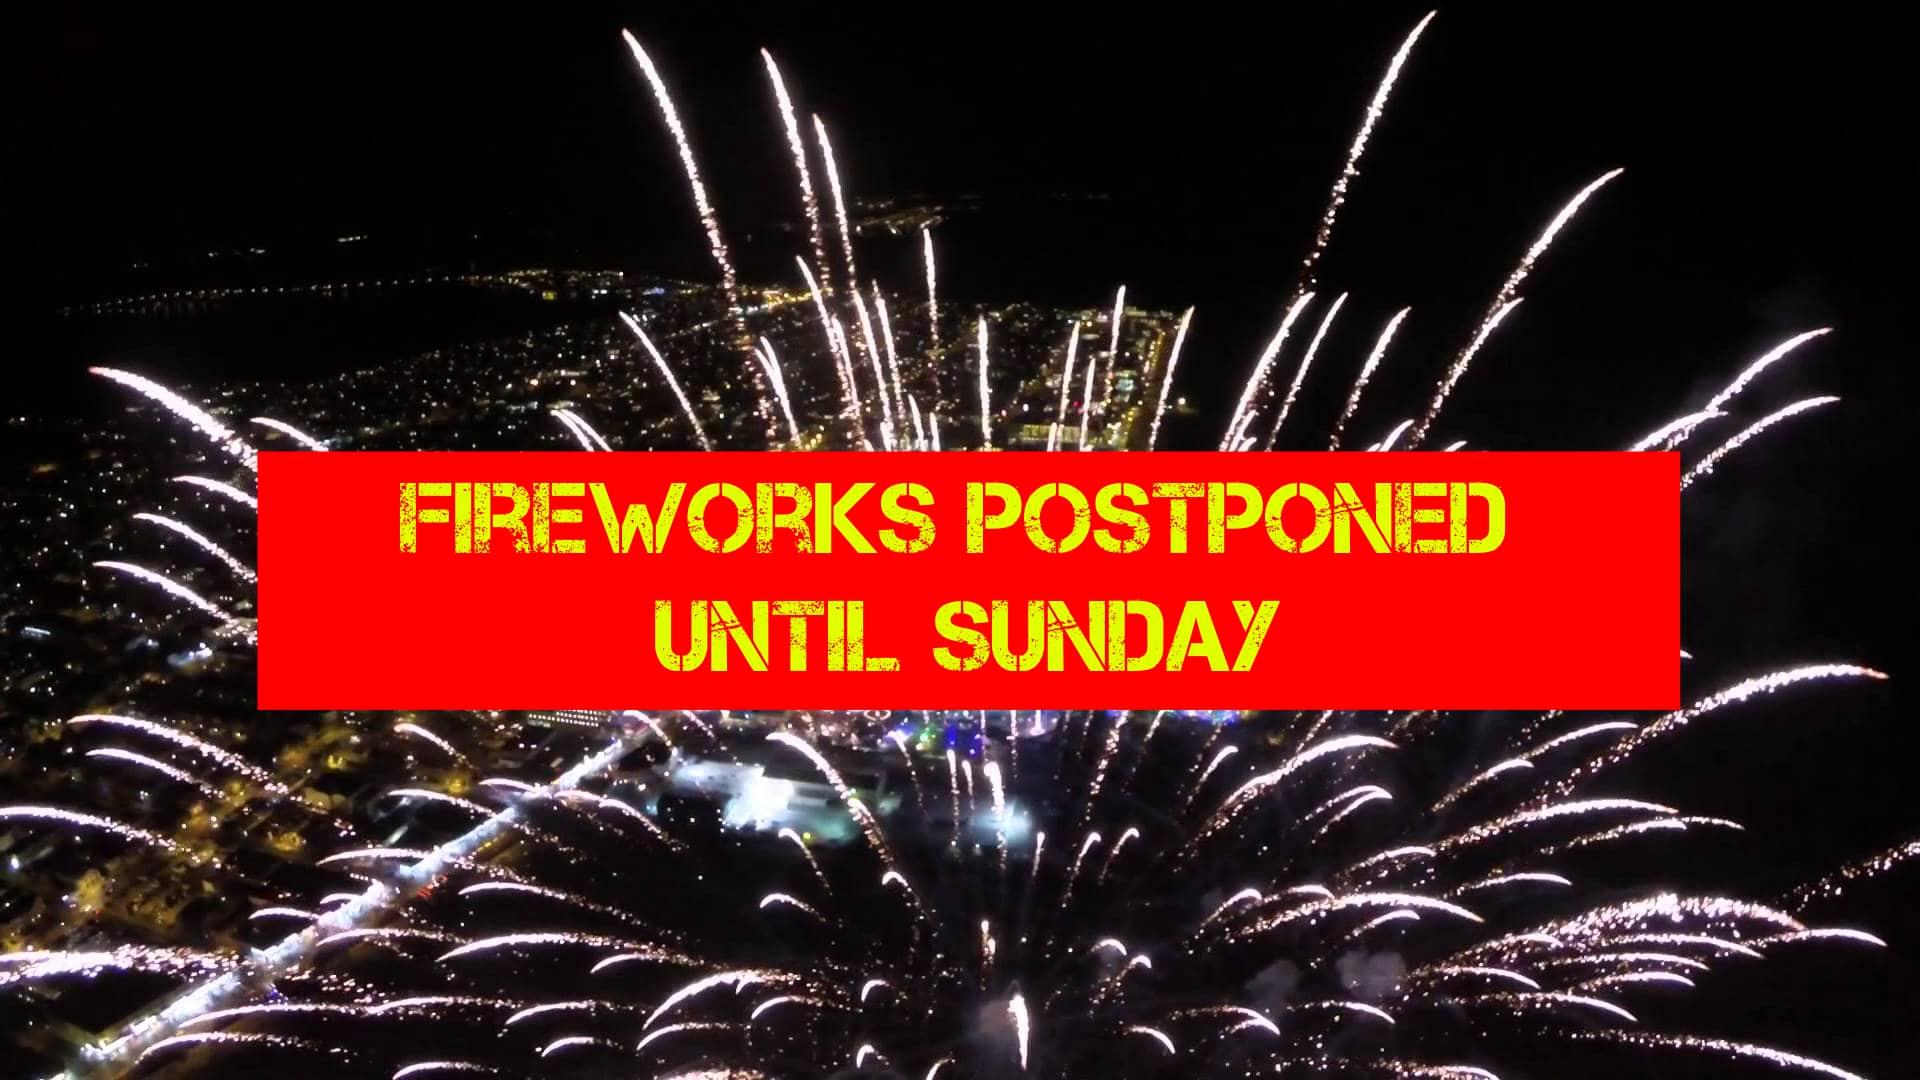 Fireworks Postponed!